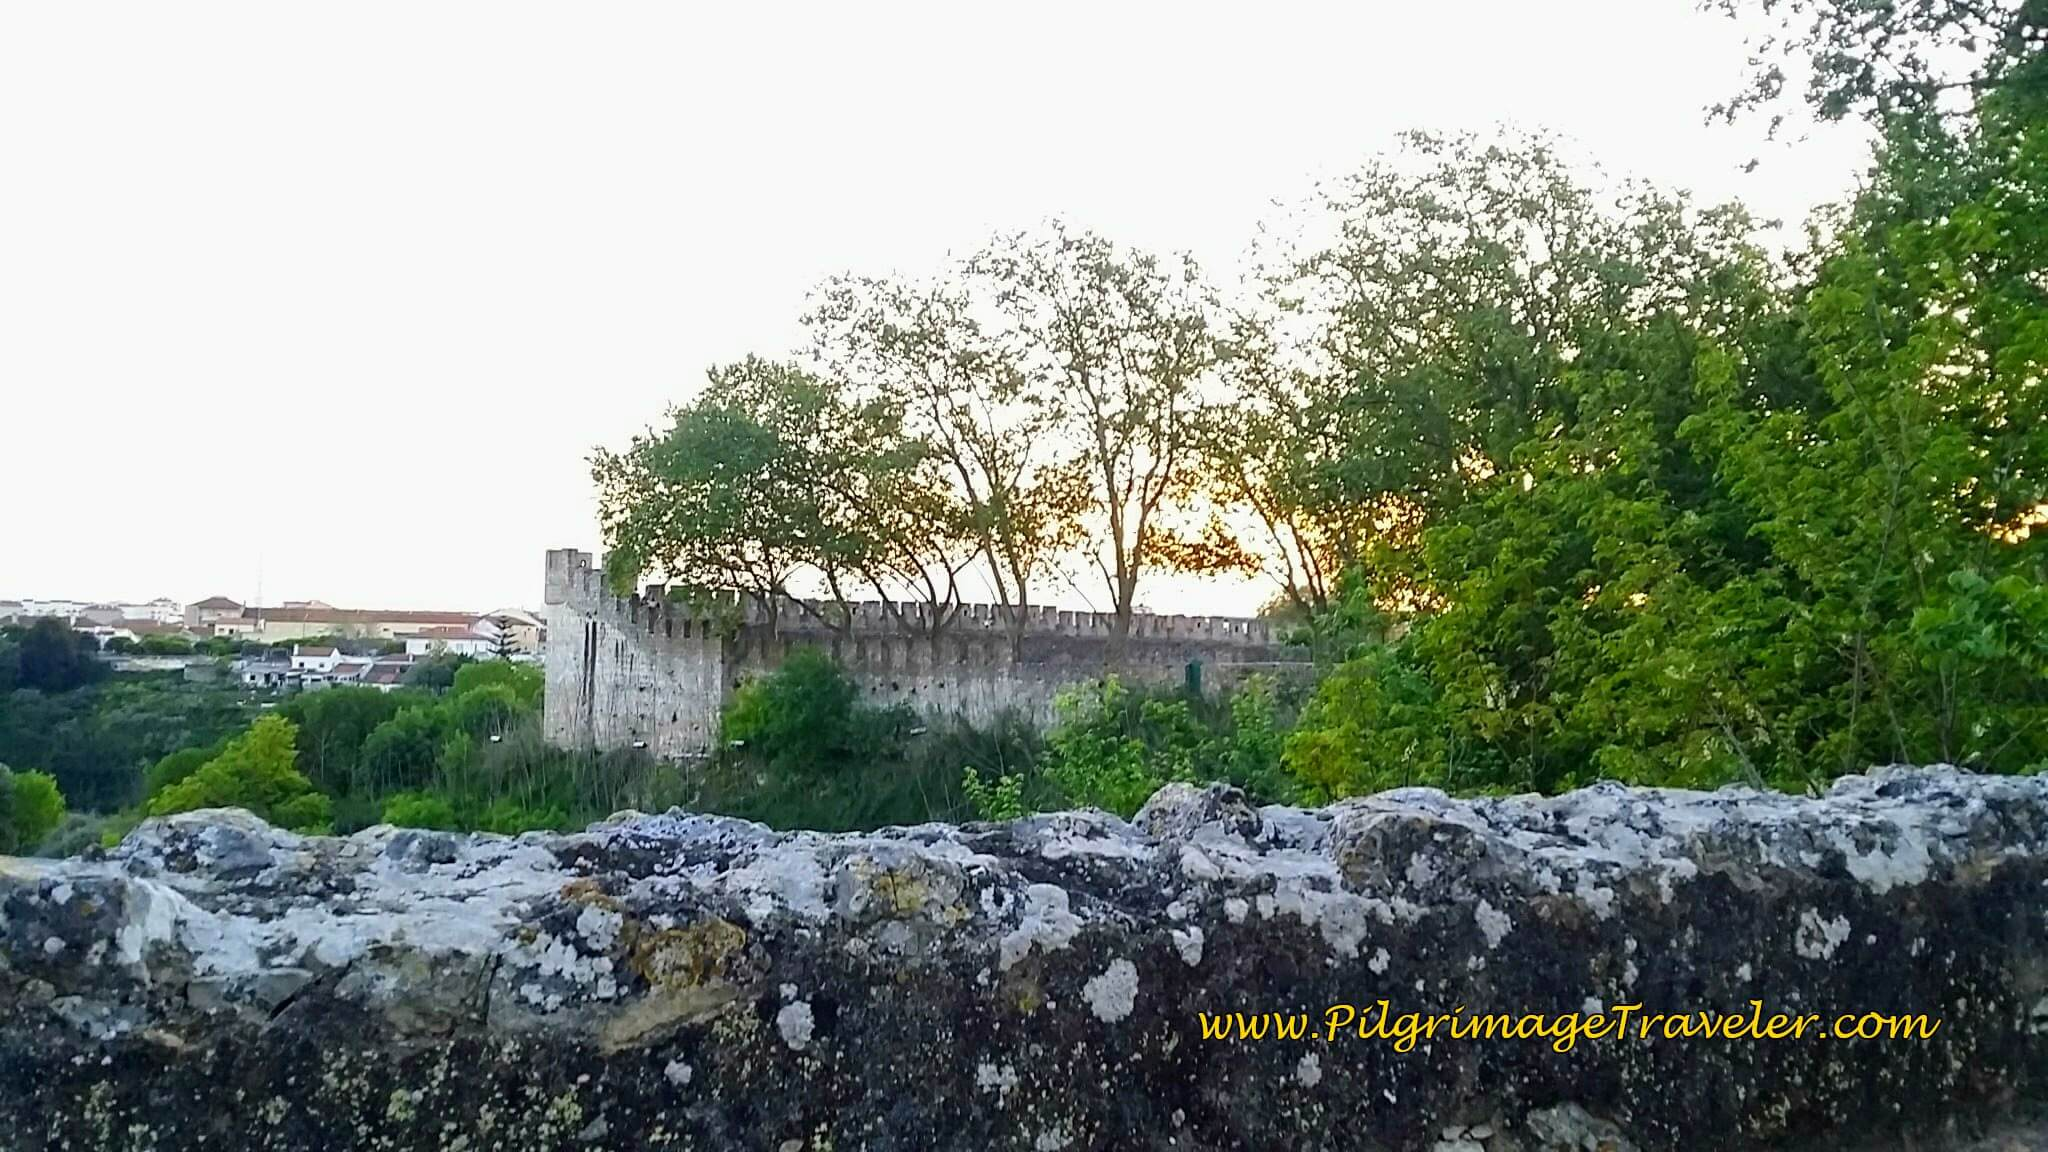 The Old Walls of Santarém, Portugal